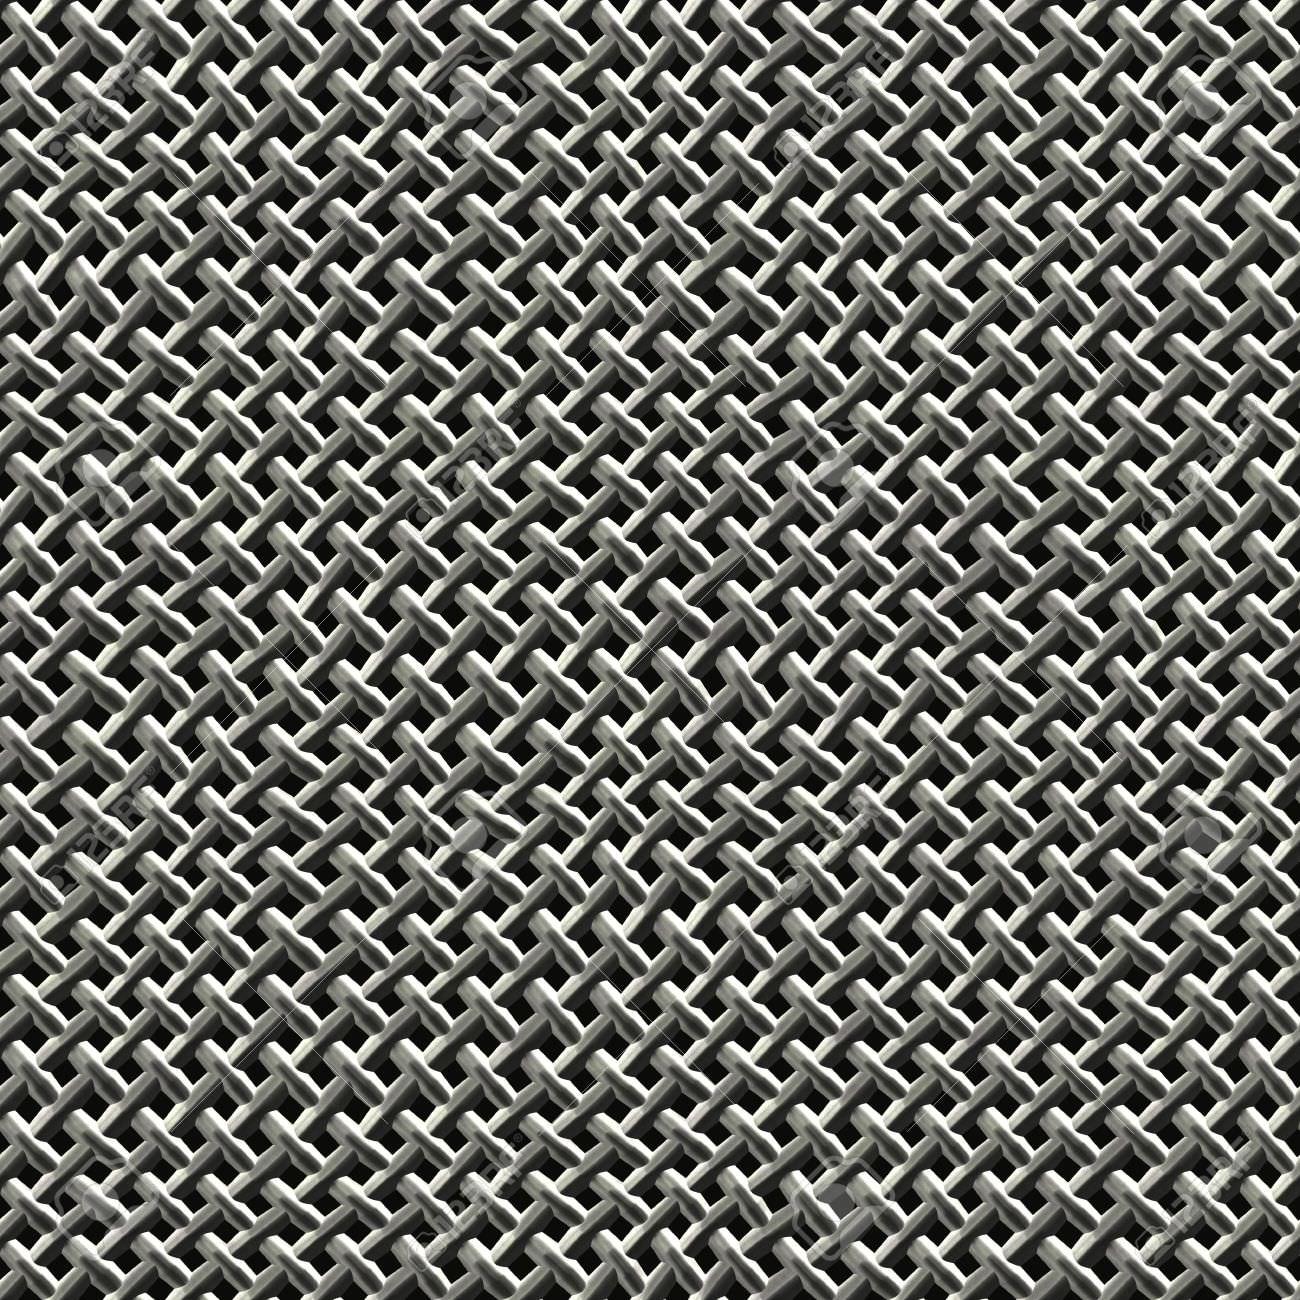 Steel textures patterns backgrounds design trends